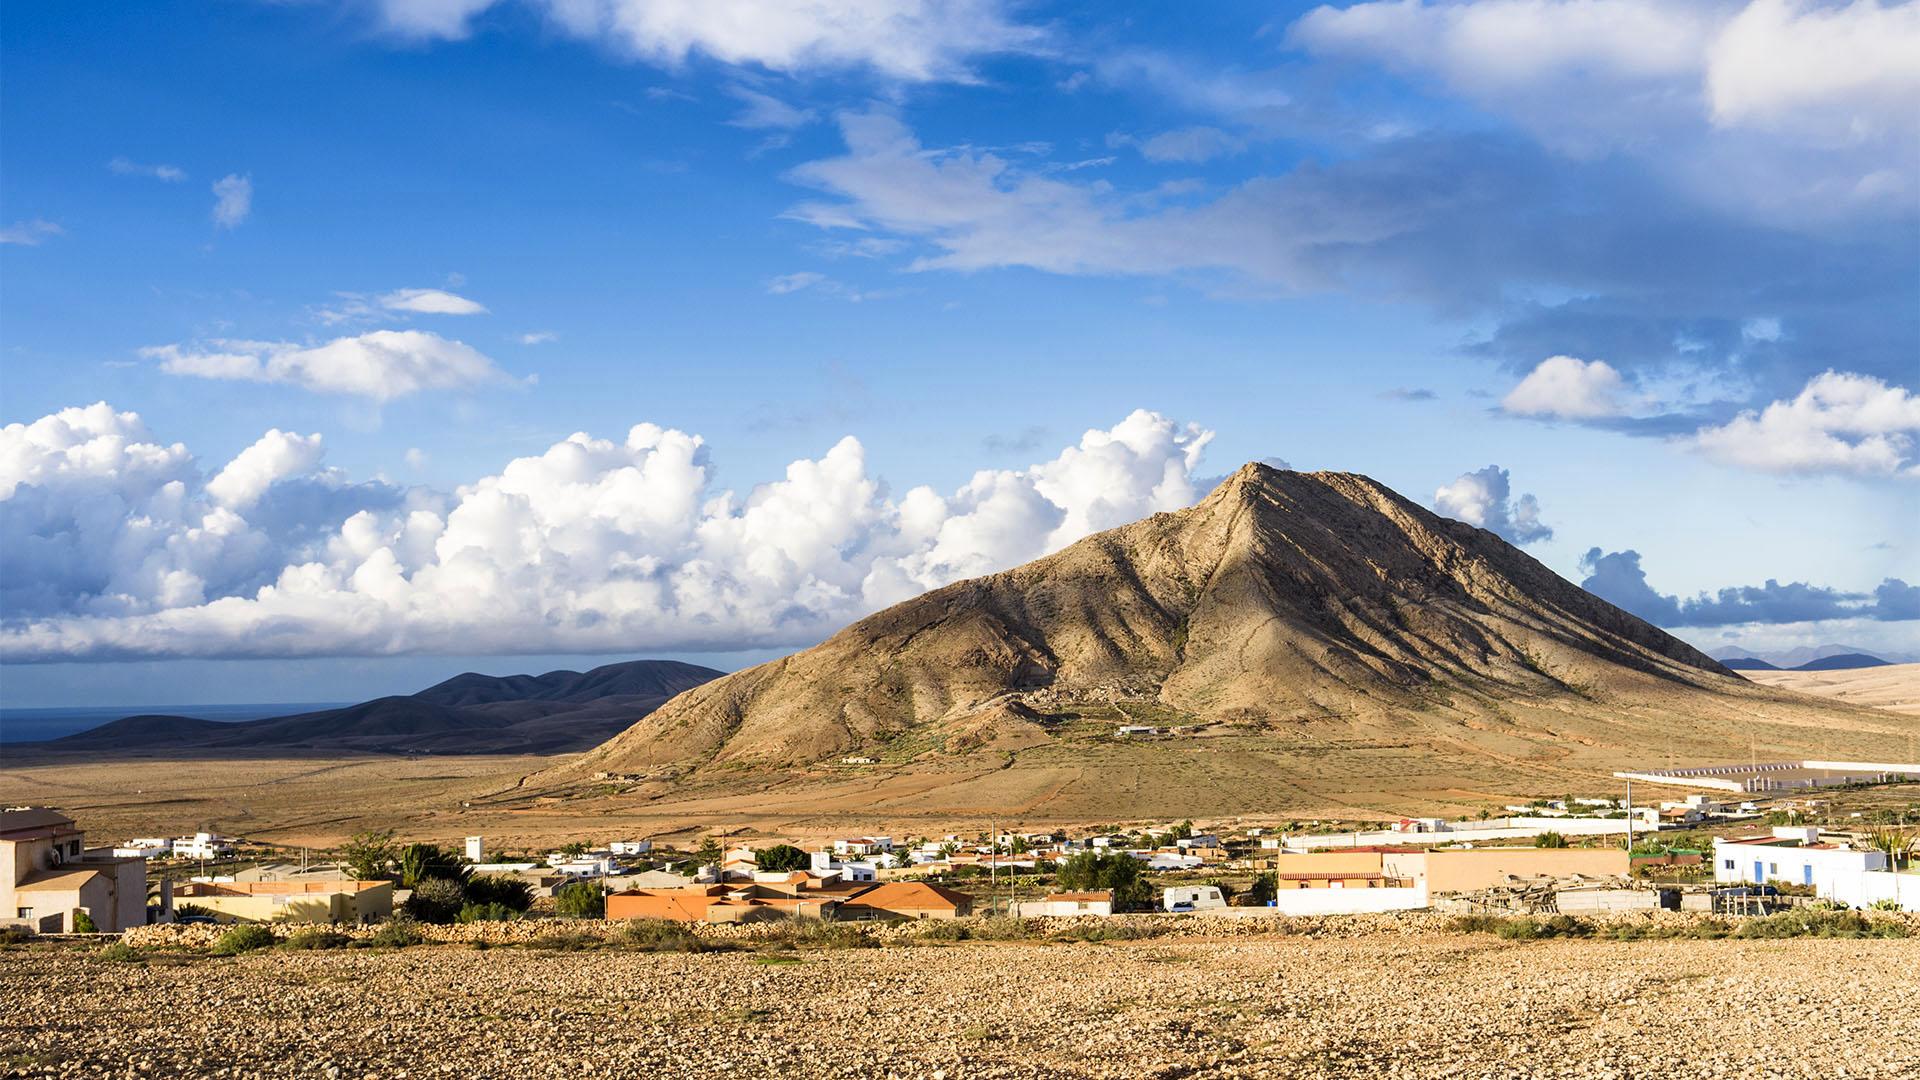 Fuerteventura Inselrundfahrt Norden –Montaña Sagrada de Tindaya.